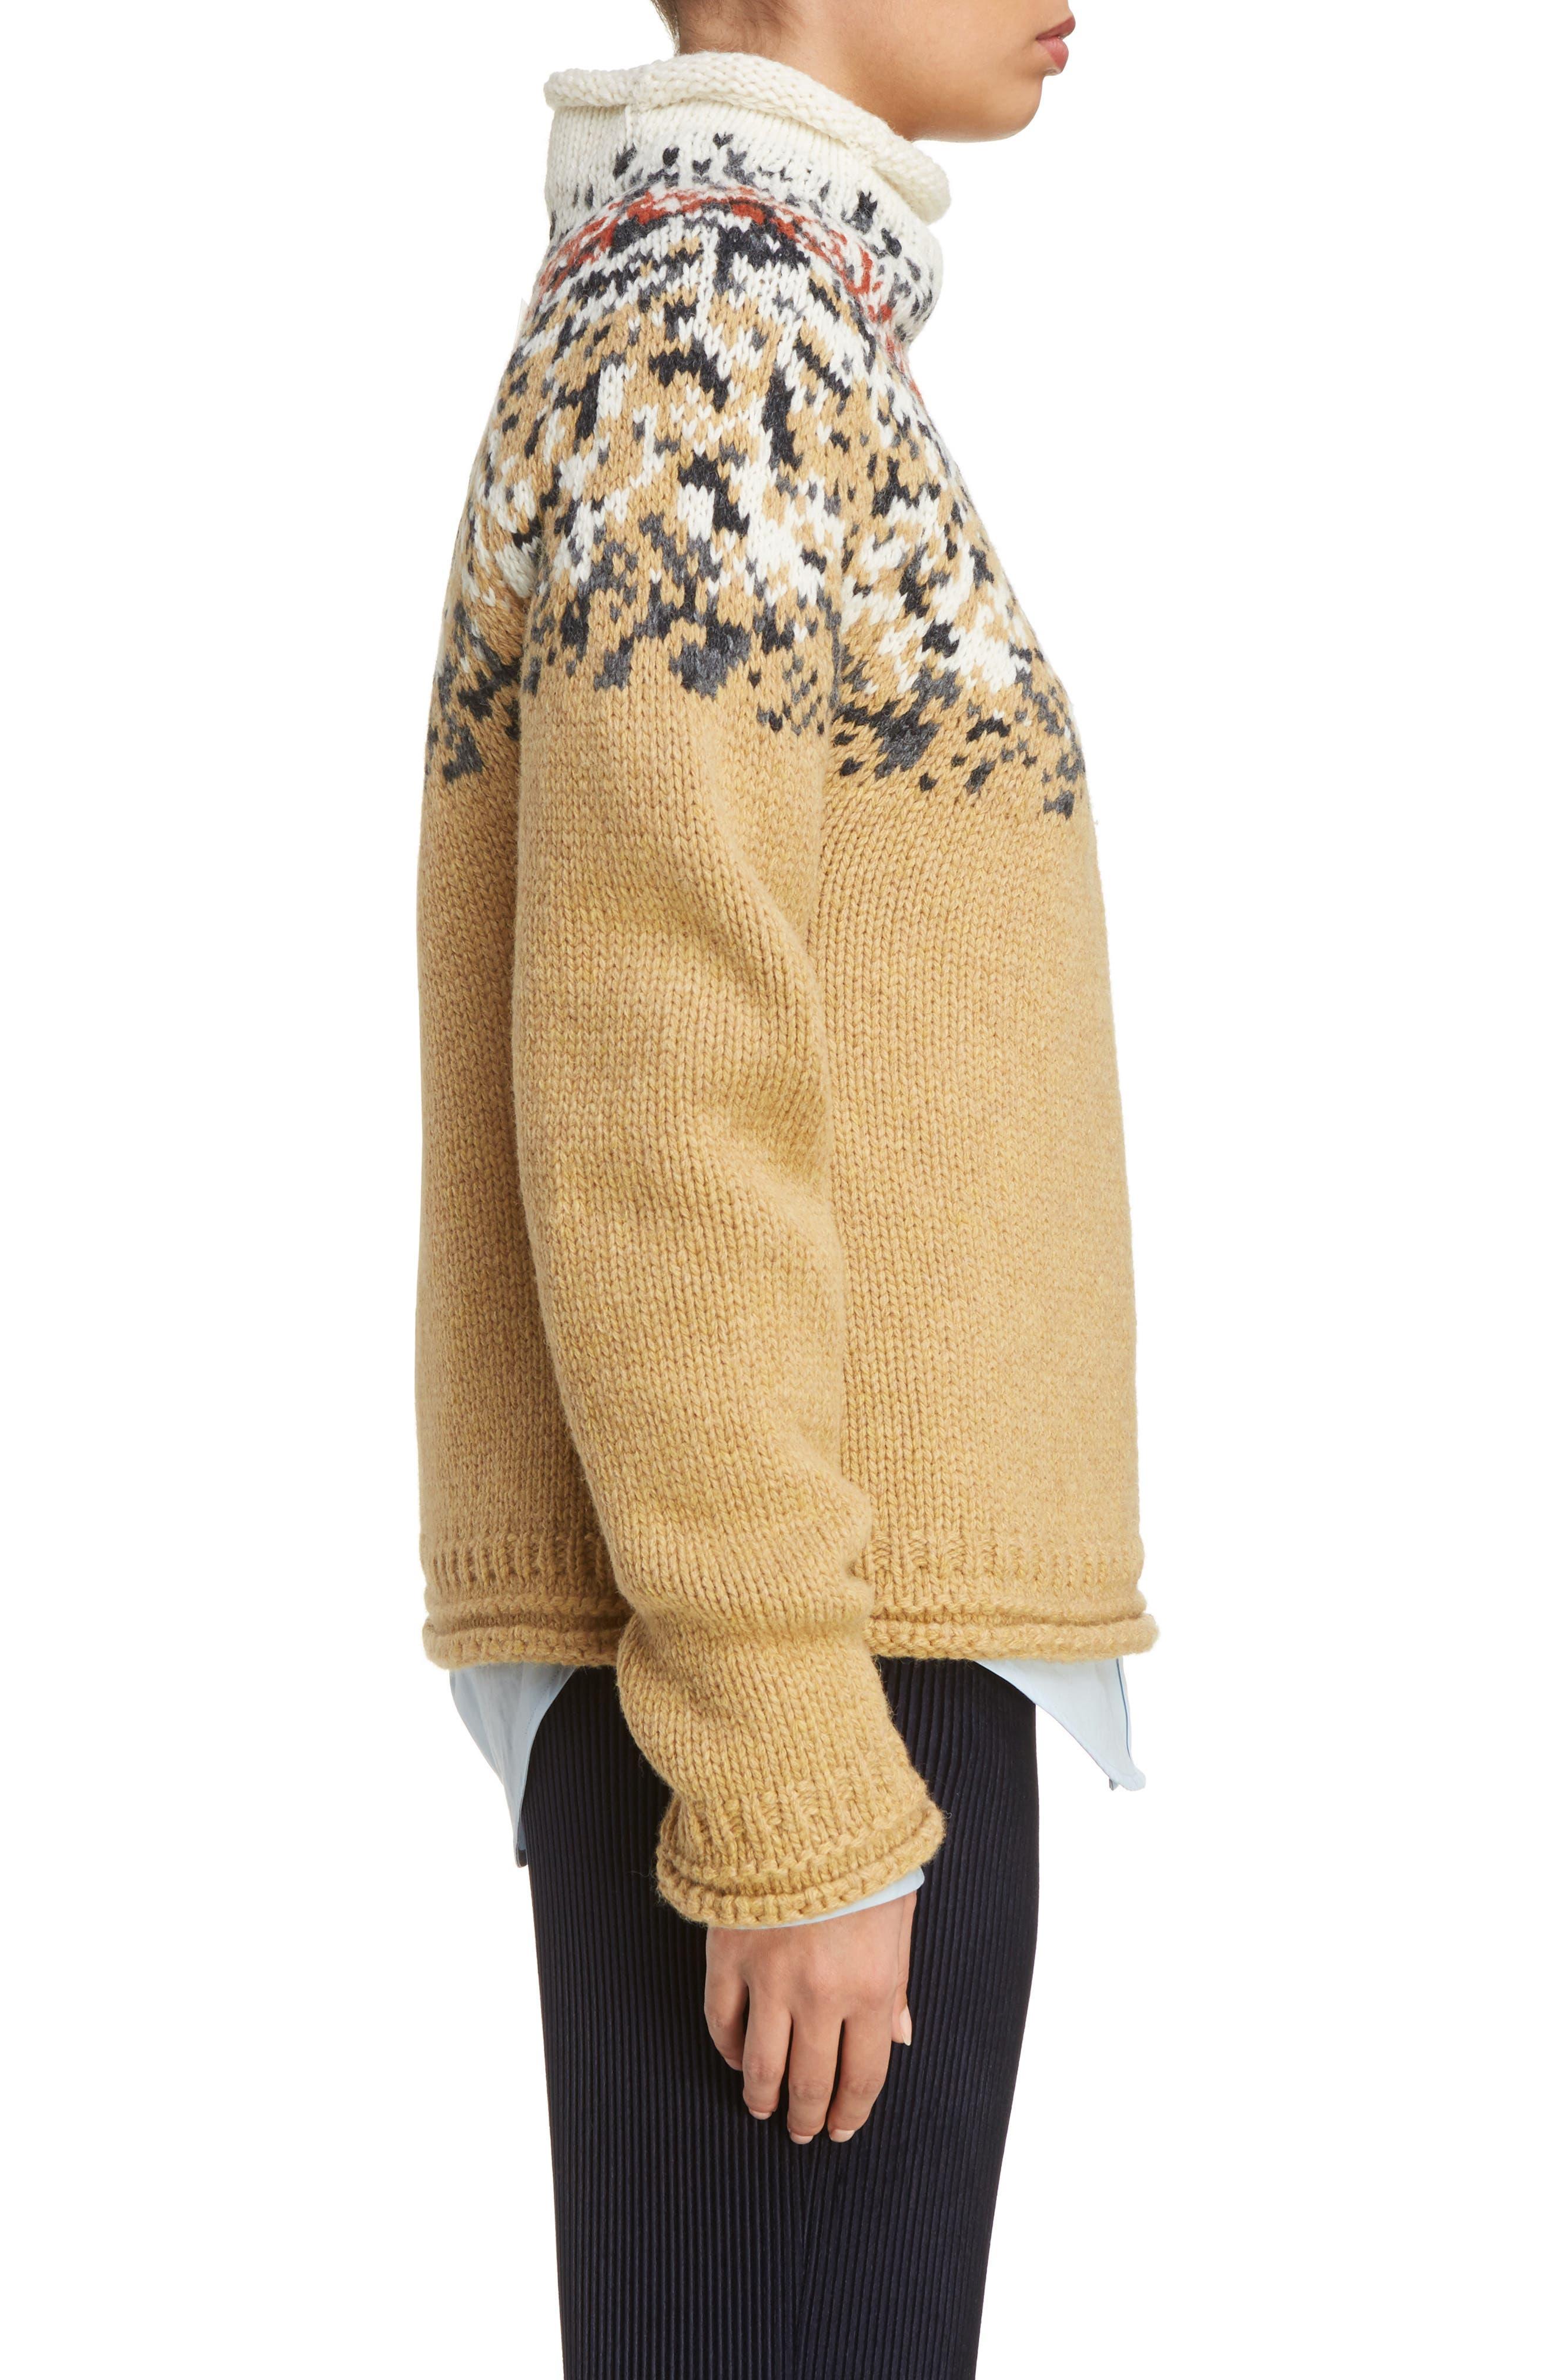 Sirius Heavy Icelandic High Neck Sweater,                             Alternate thumbnail 3, color,                             250